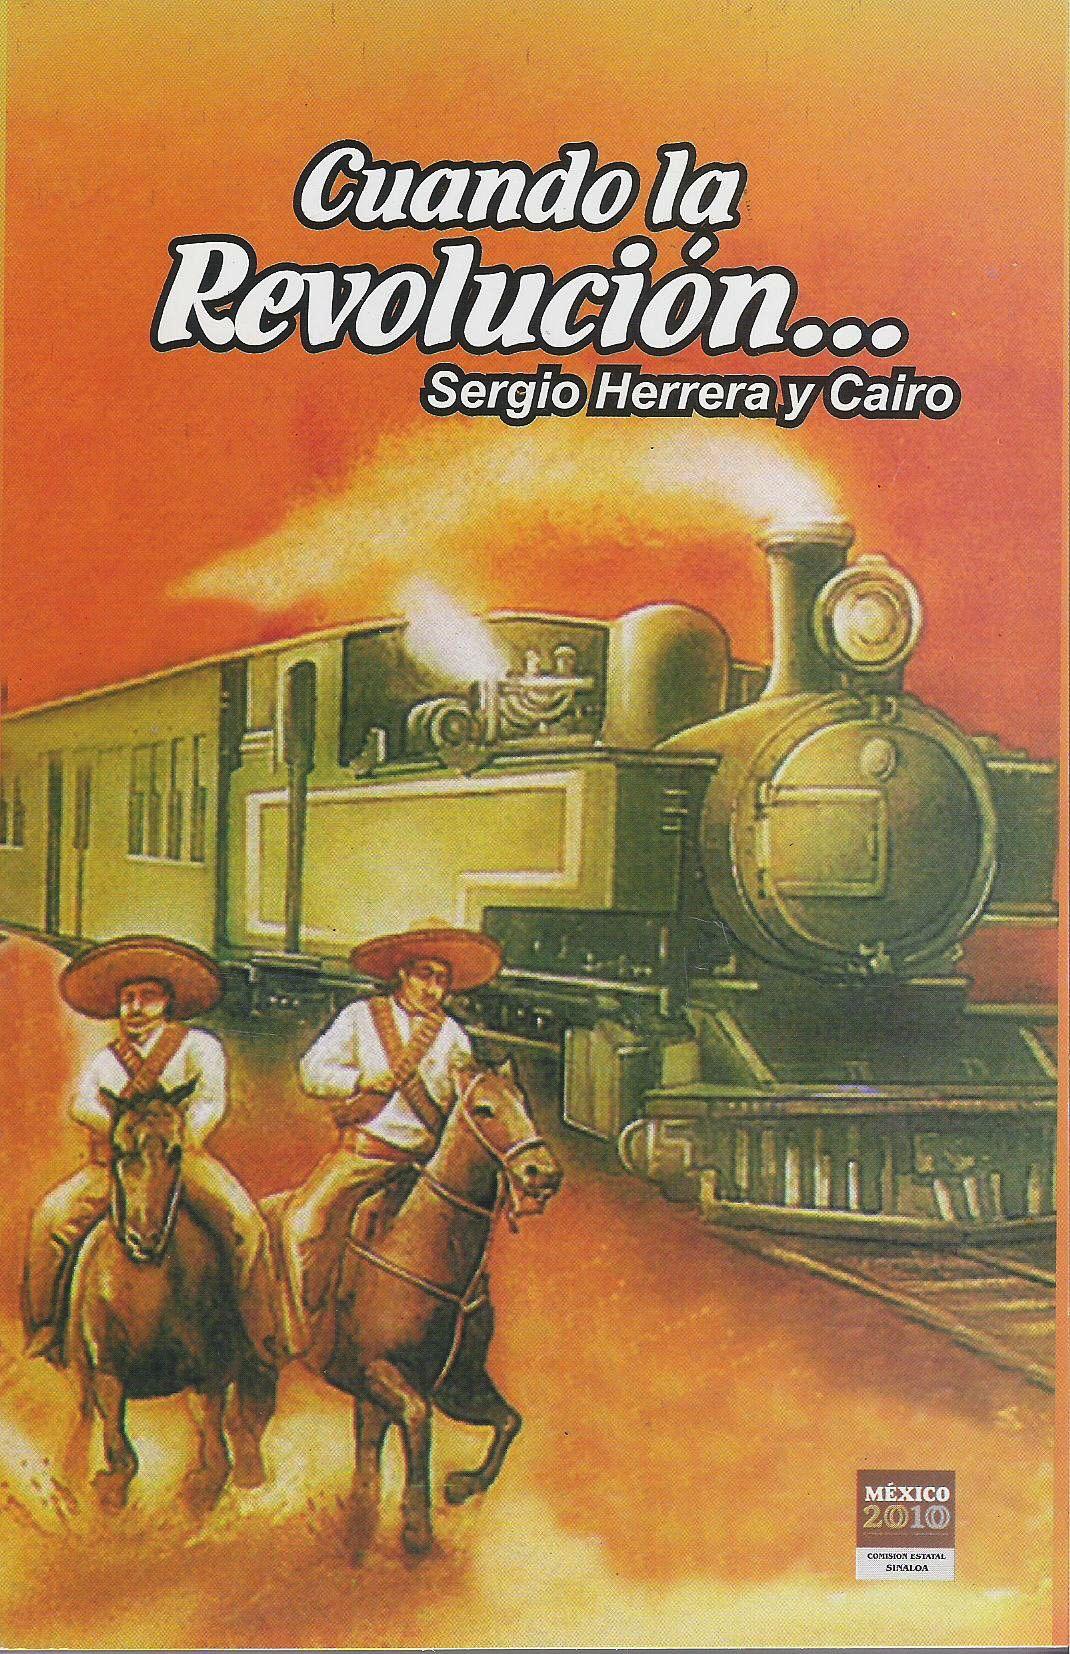 Cuando la Revoluci¢n...